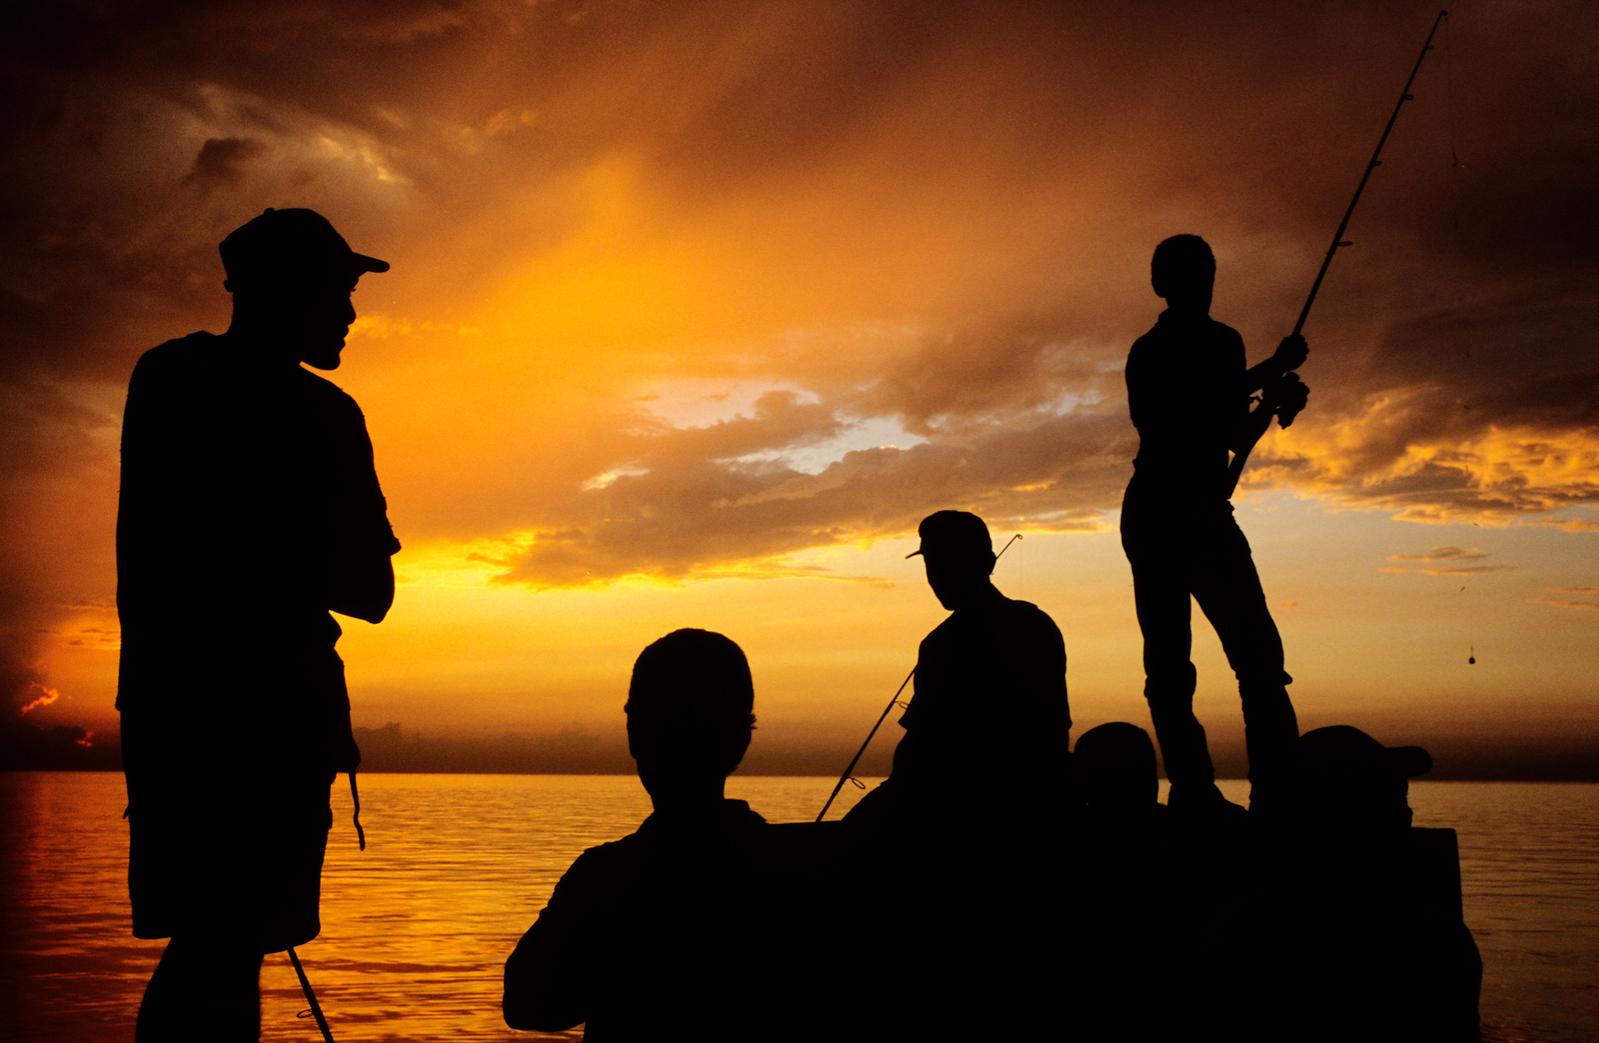 people fishing at Malecòn seafront. La Havana, June 2005.